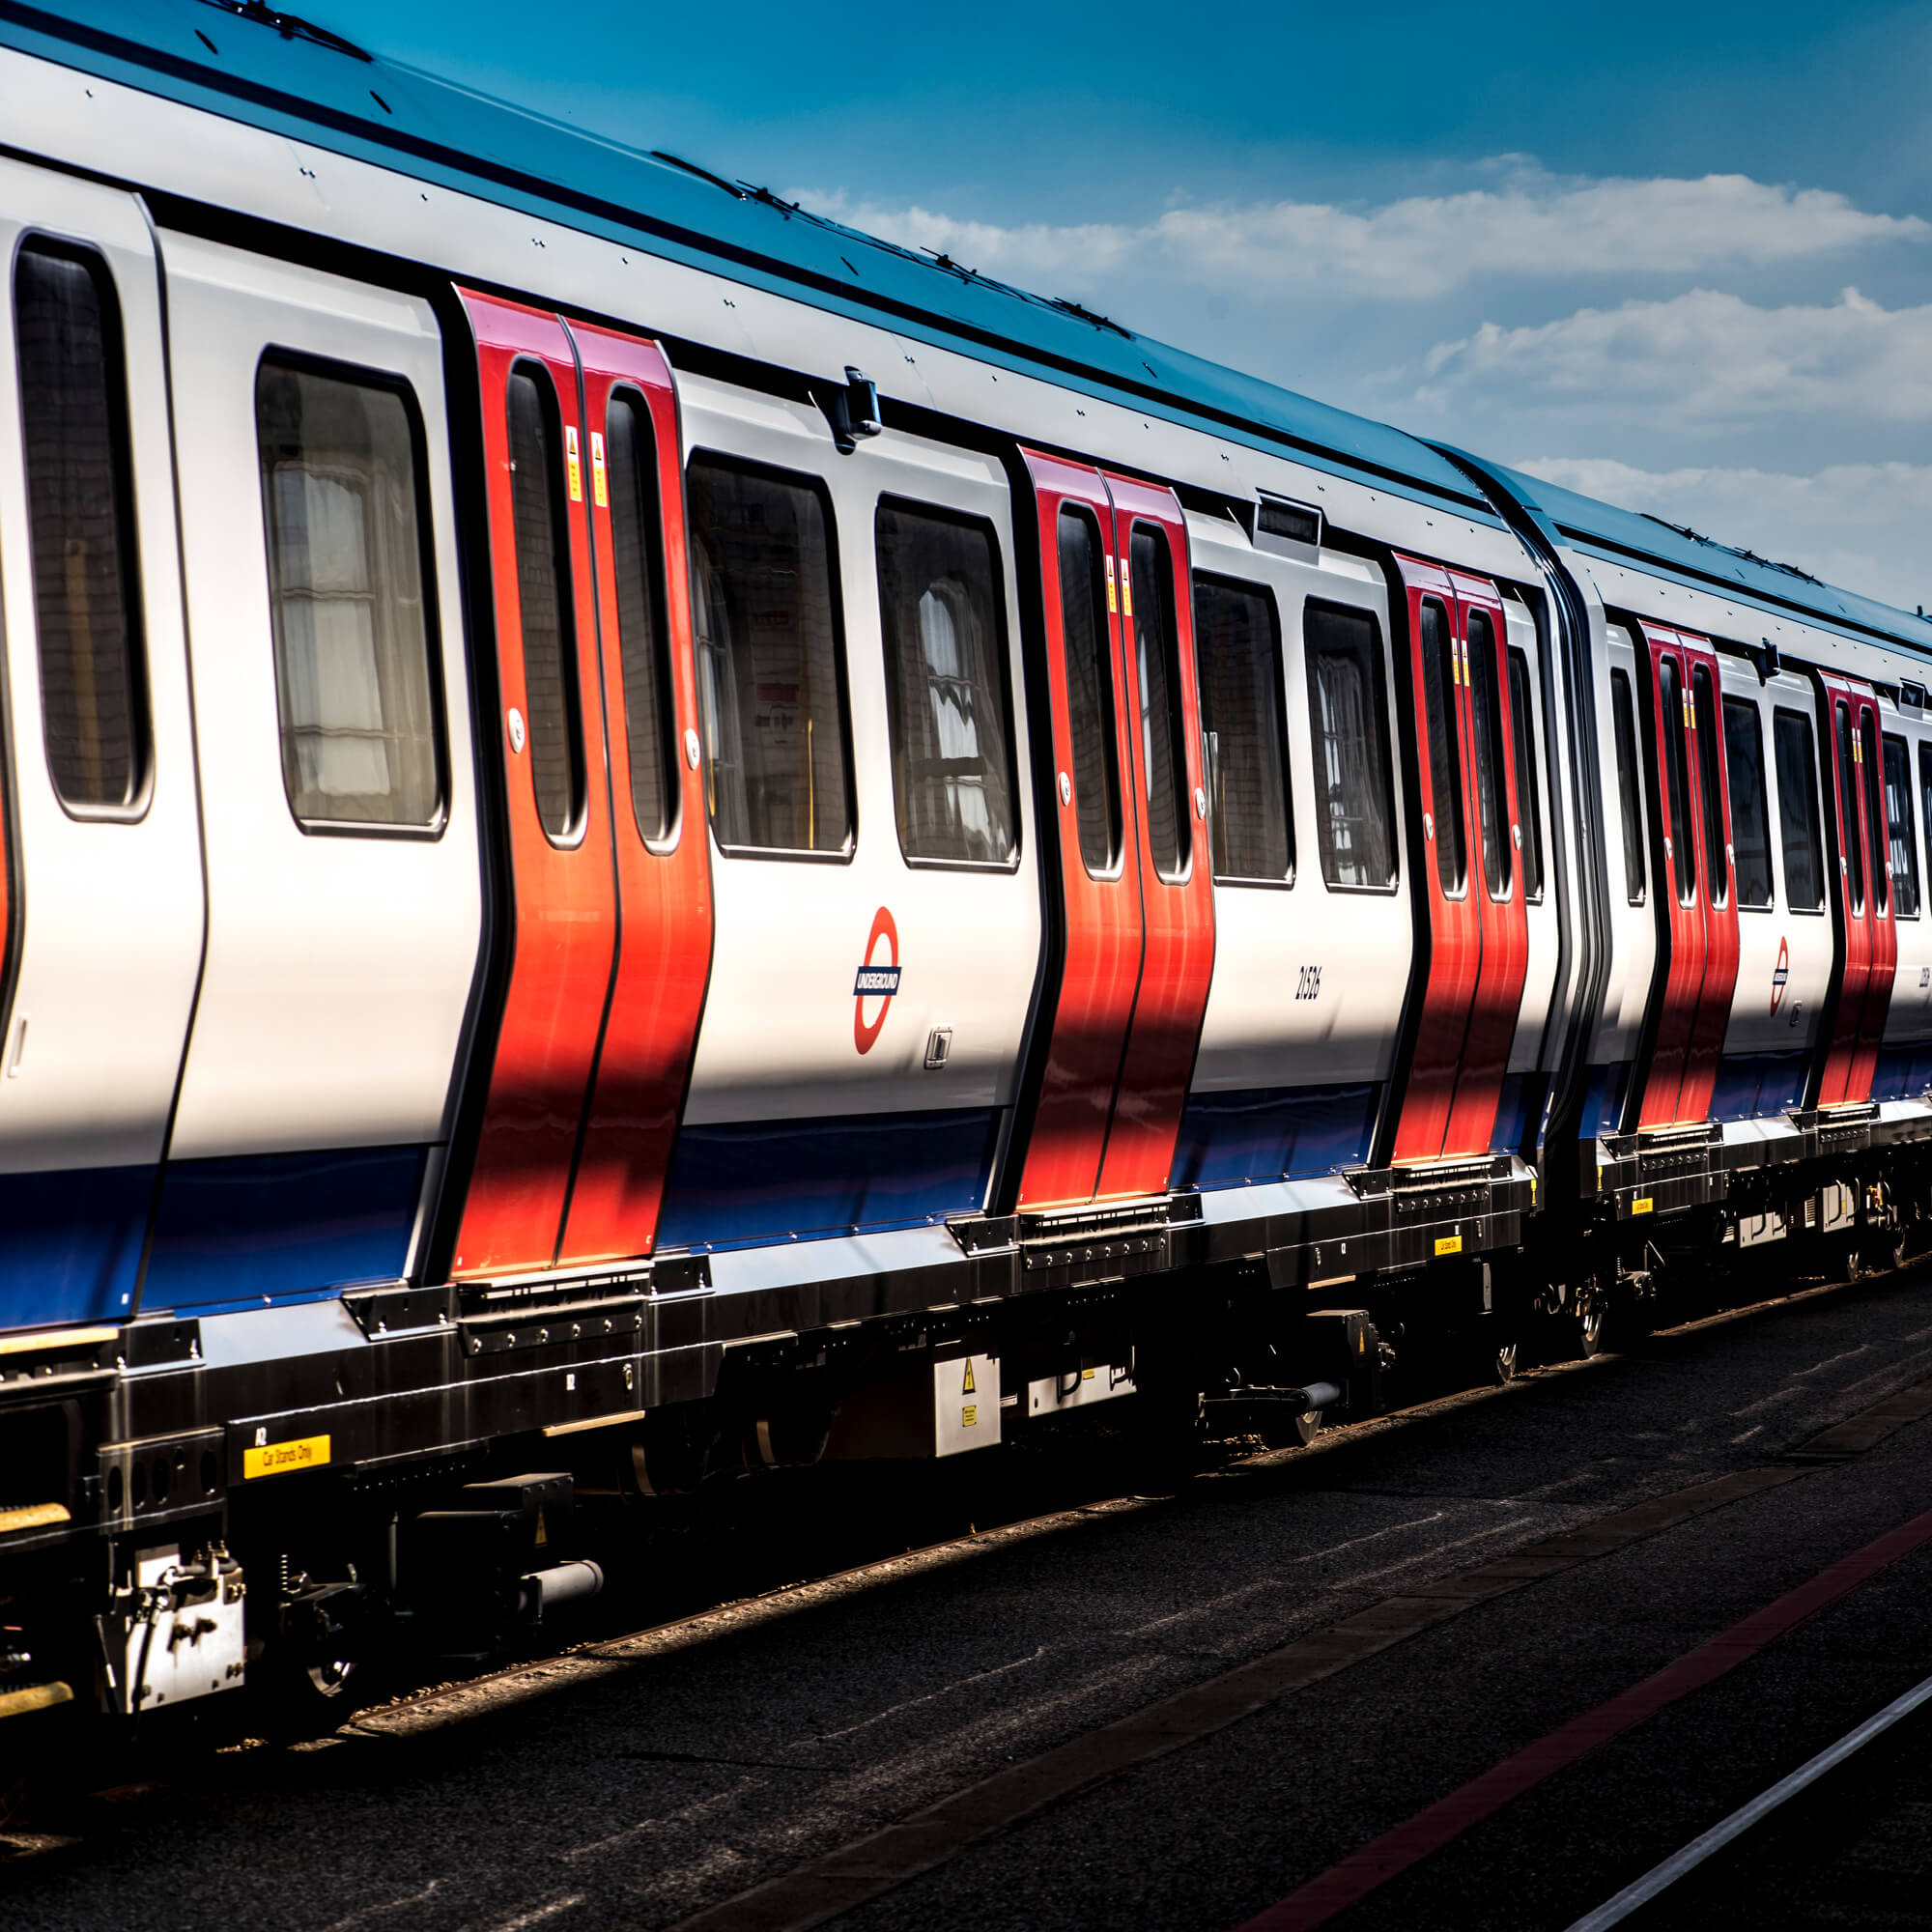 Bombardier trains